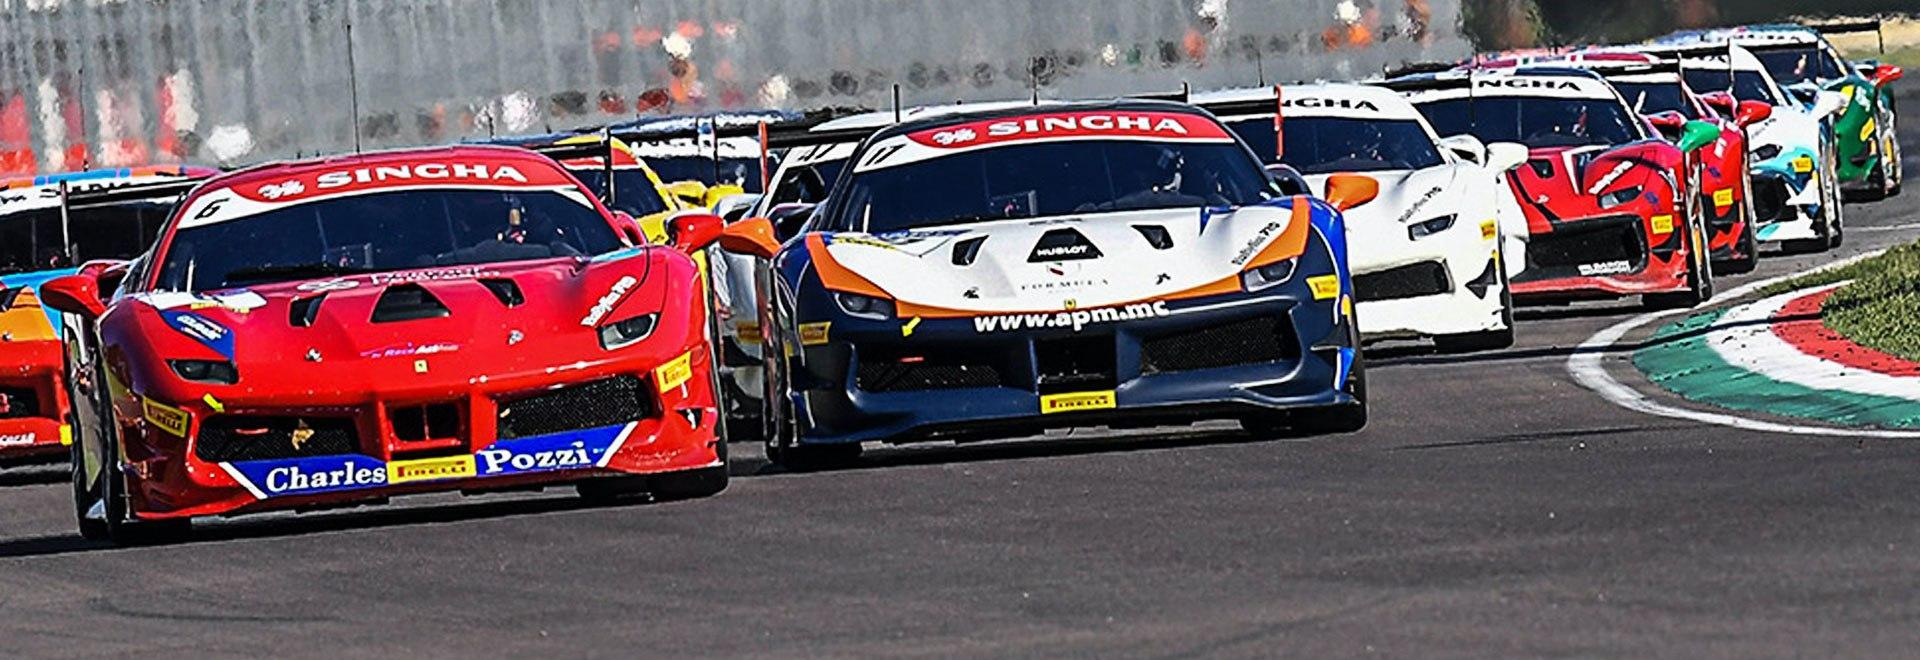 Trofeo Pirelli Imola. Gara 1